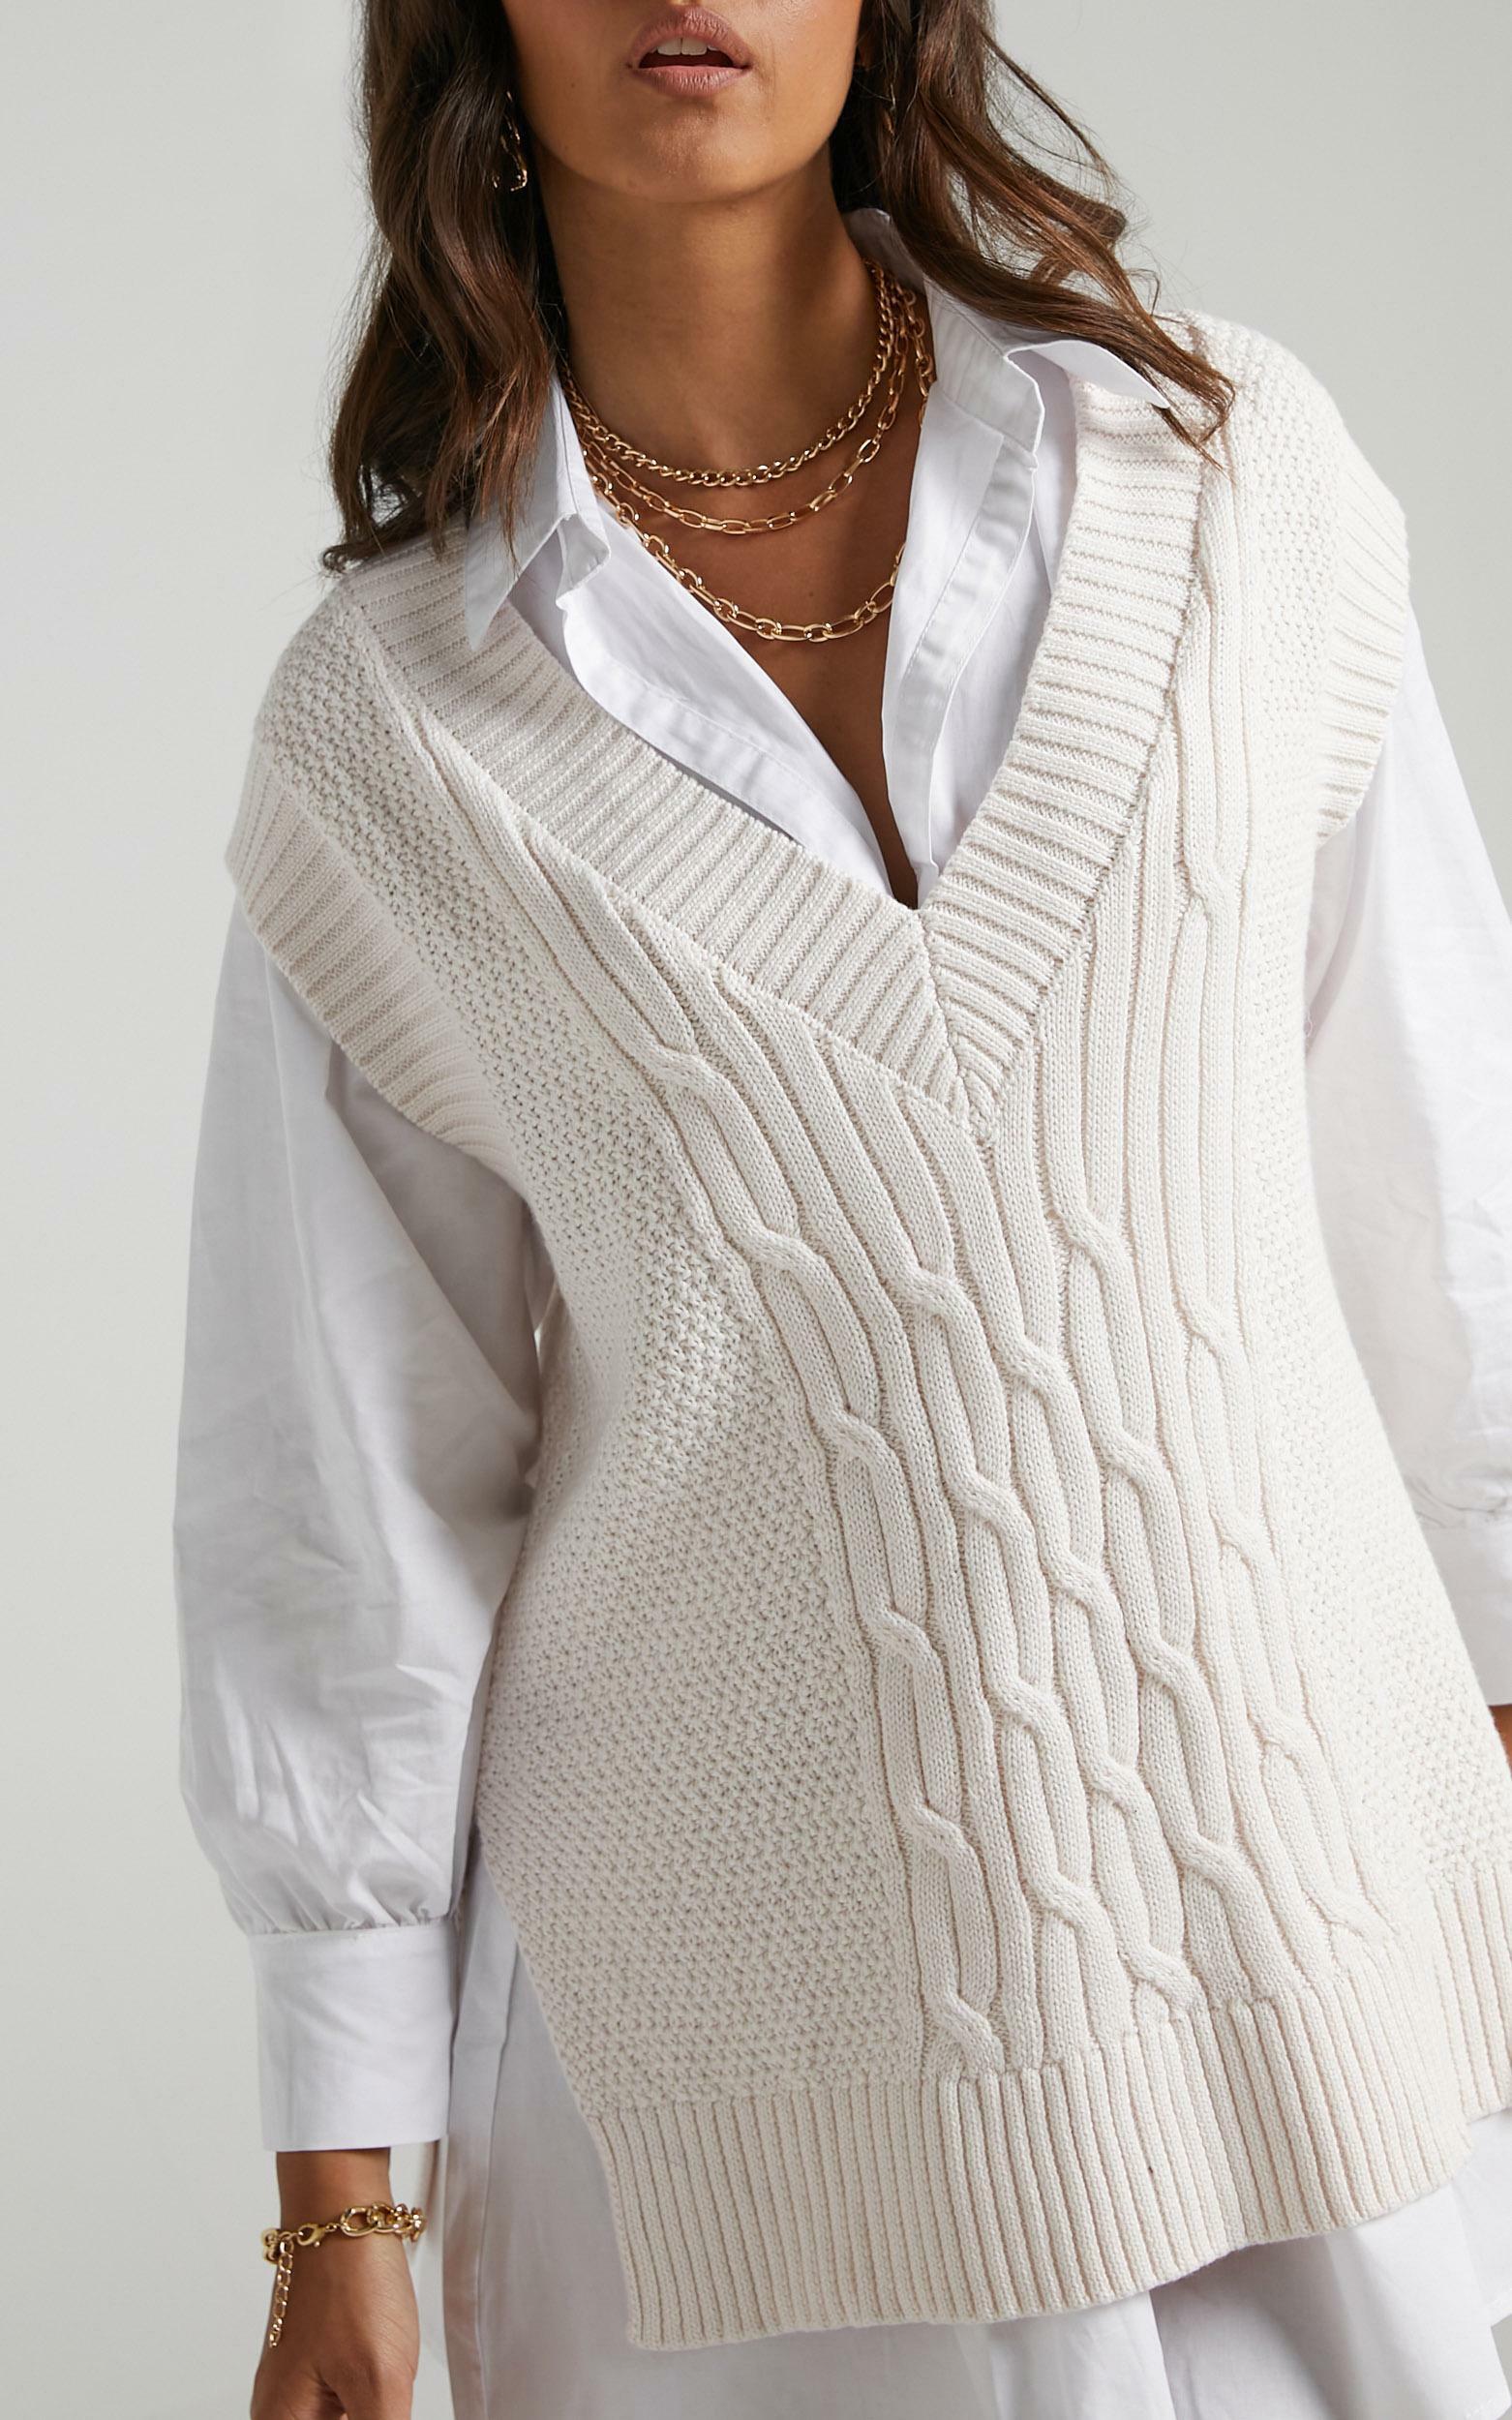 Cadha Knit Vest in Cream - 06, CRE2, hi-res image number null